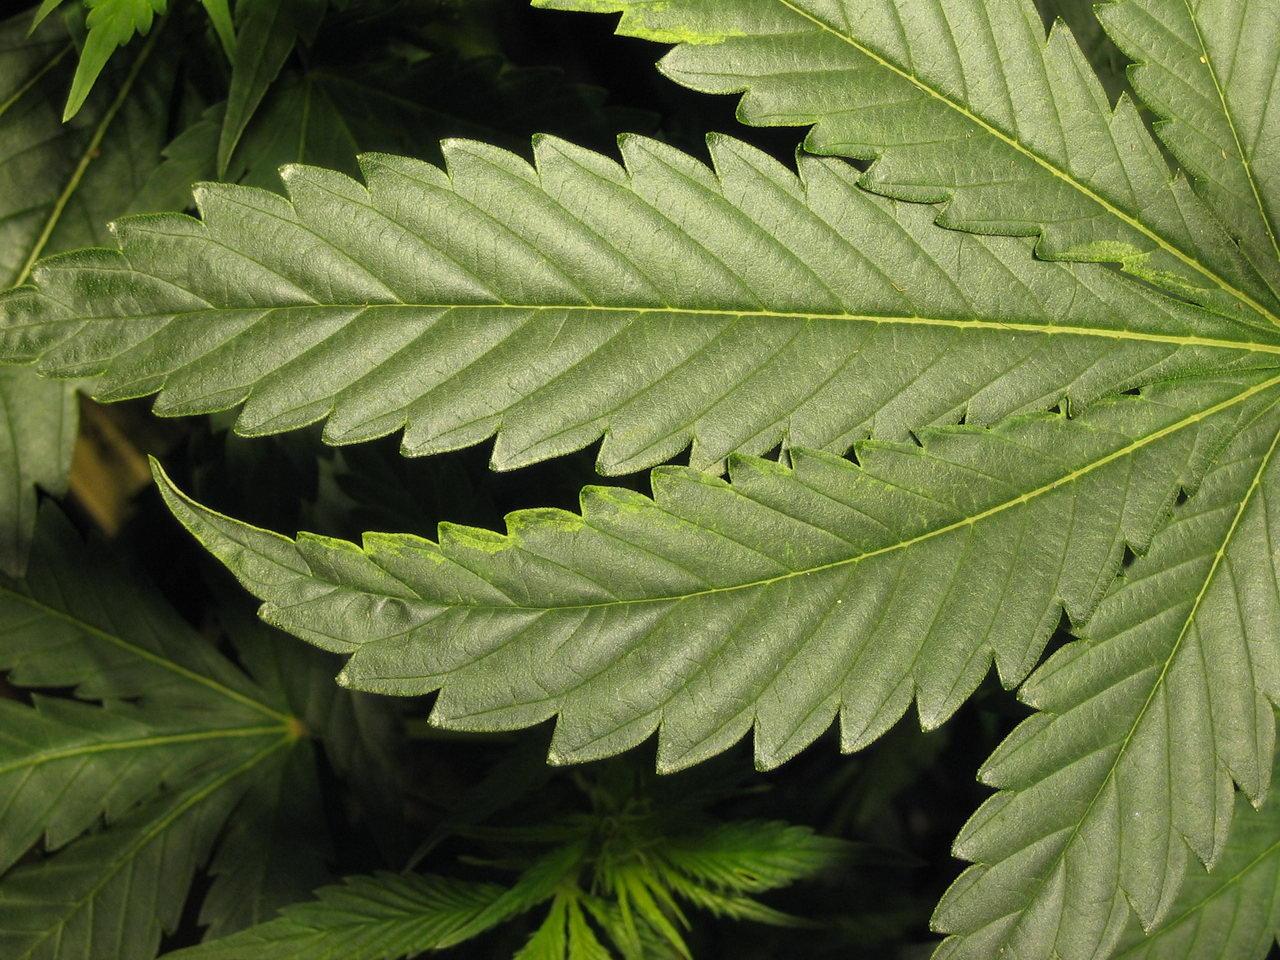 Pale Blotchy Leaves On Bubba Kush Clone Pics